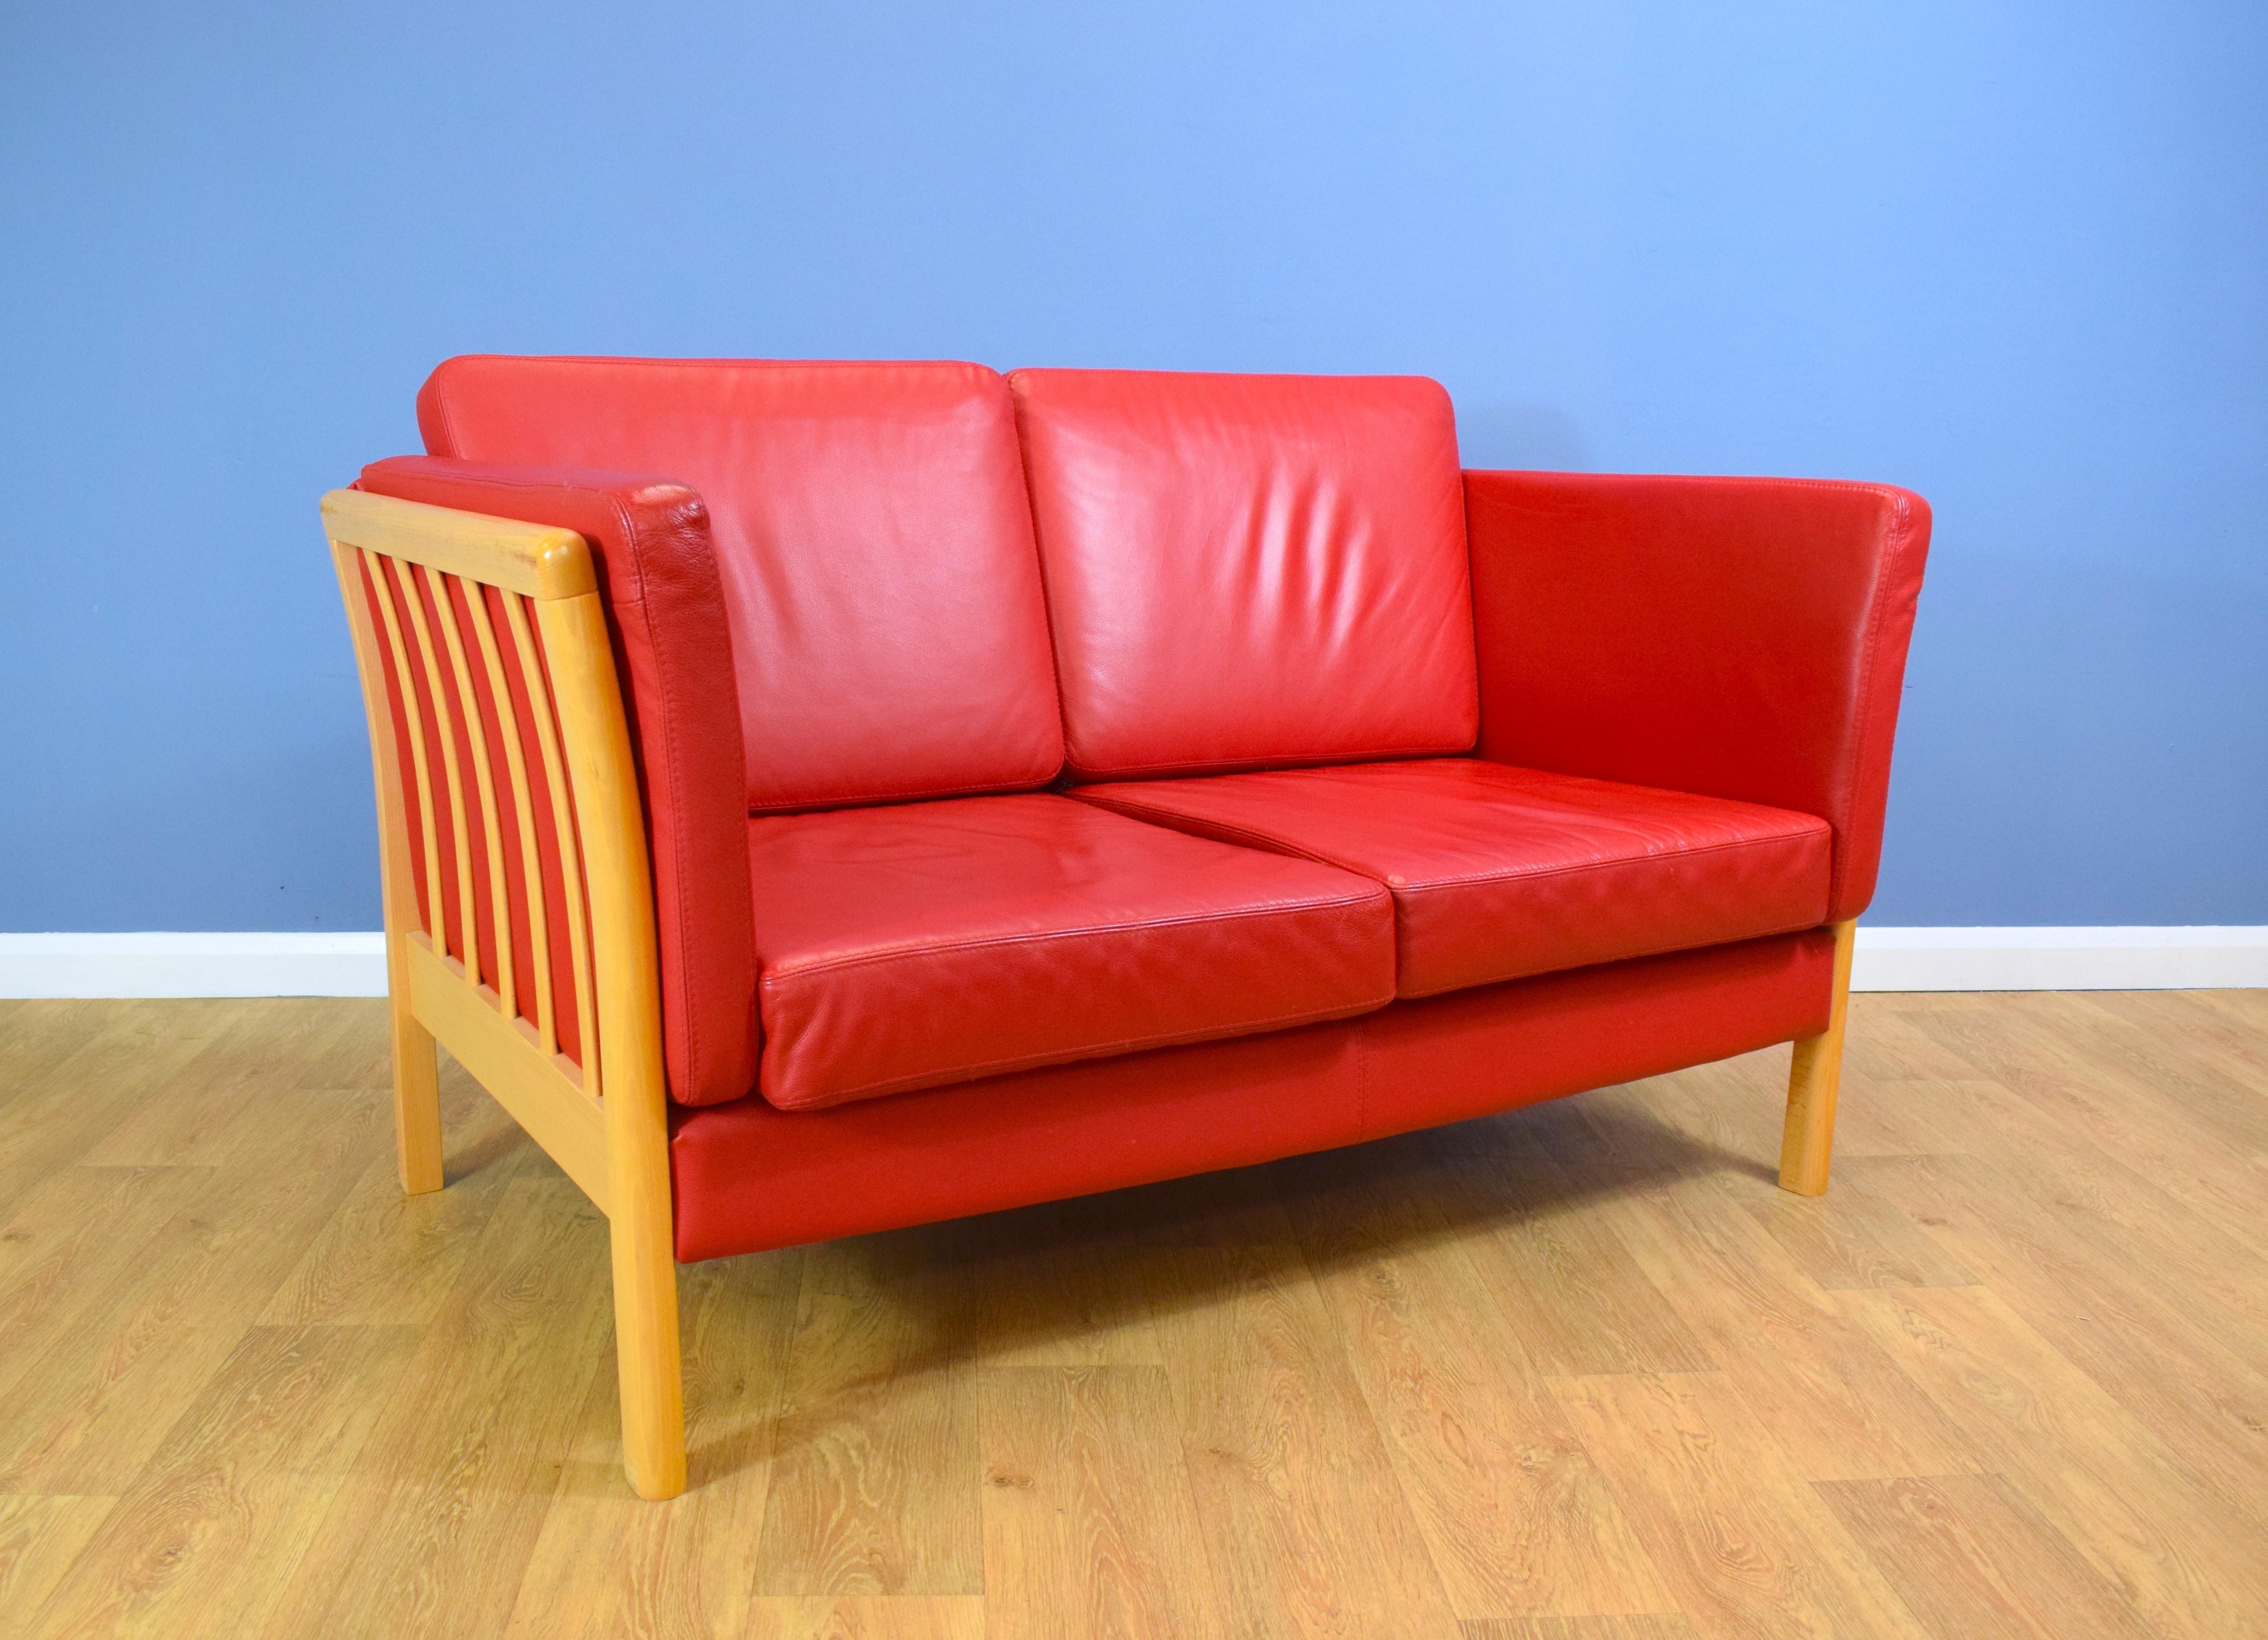 Brilliant Mid Century Retro Modern Danish Red Leather Stouby Style Sofa Settee 1990S Inzonedesignstudio Interior Chair Design Inzonedesignstudiocom